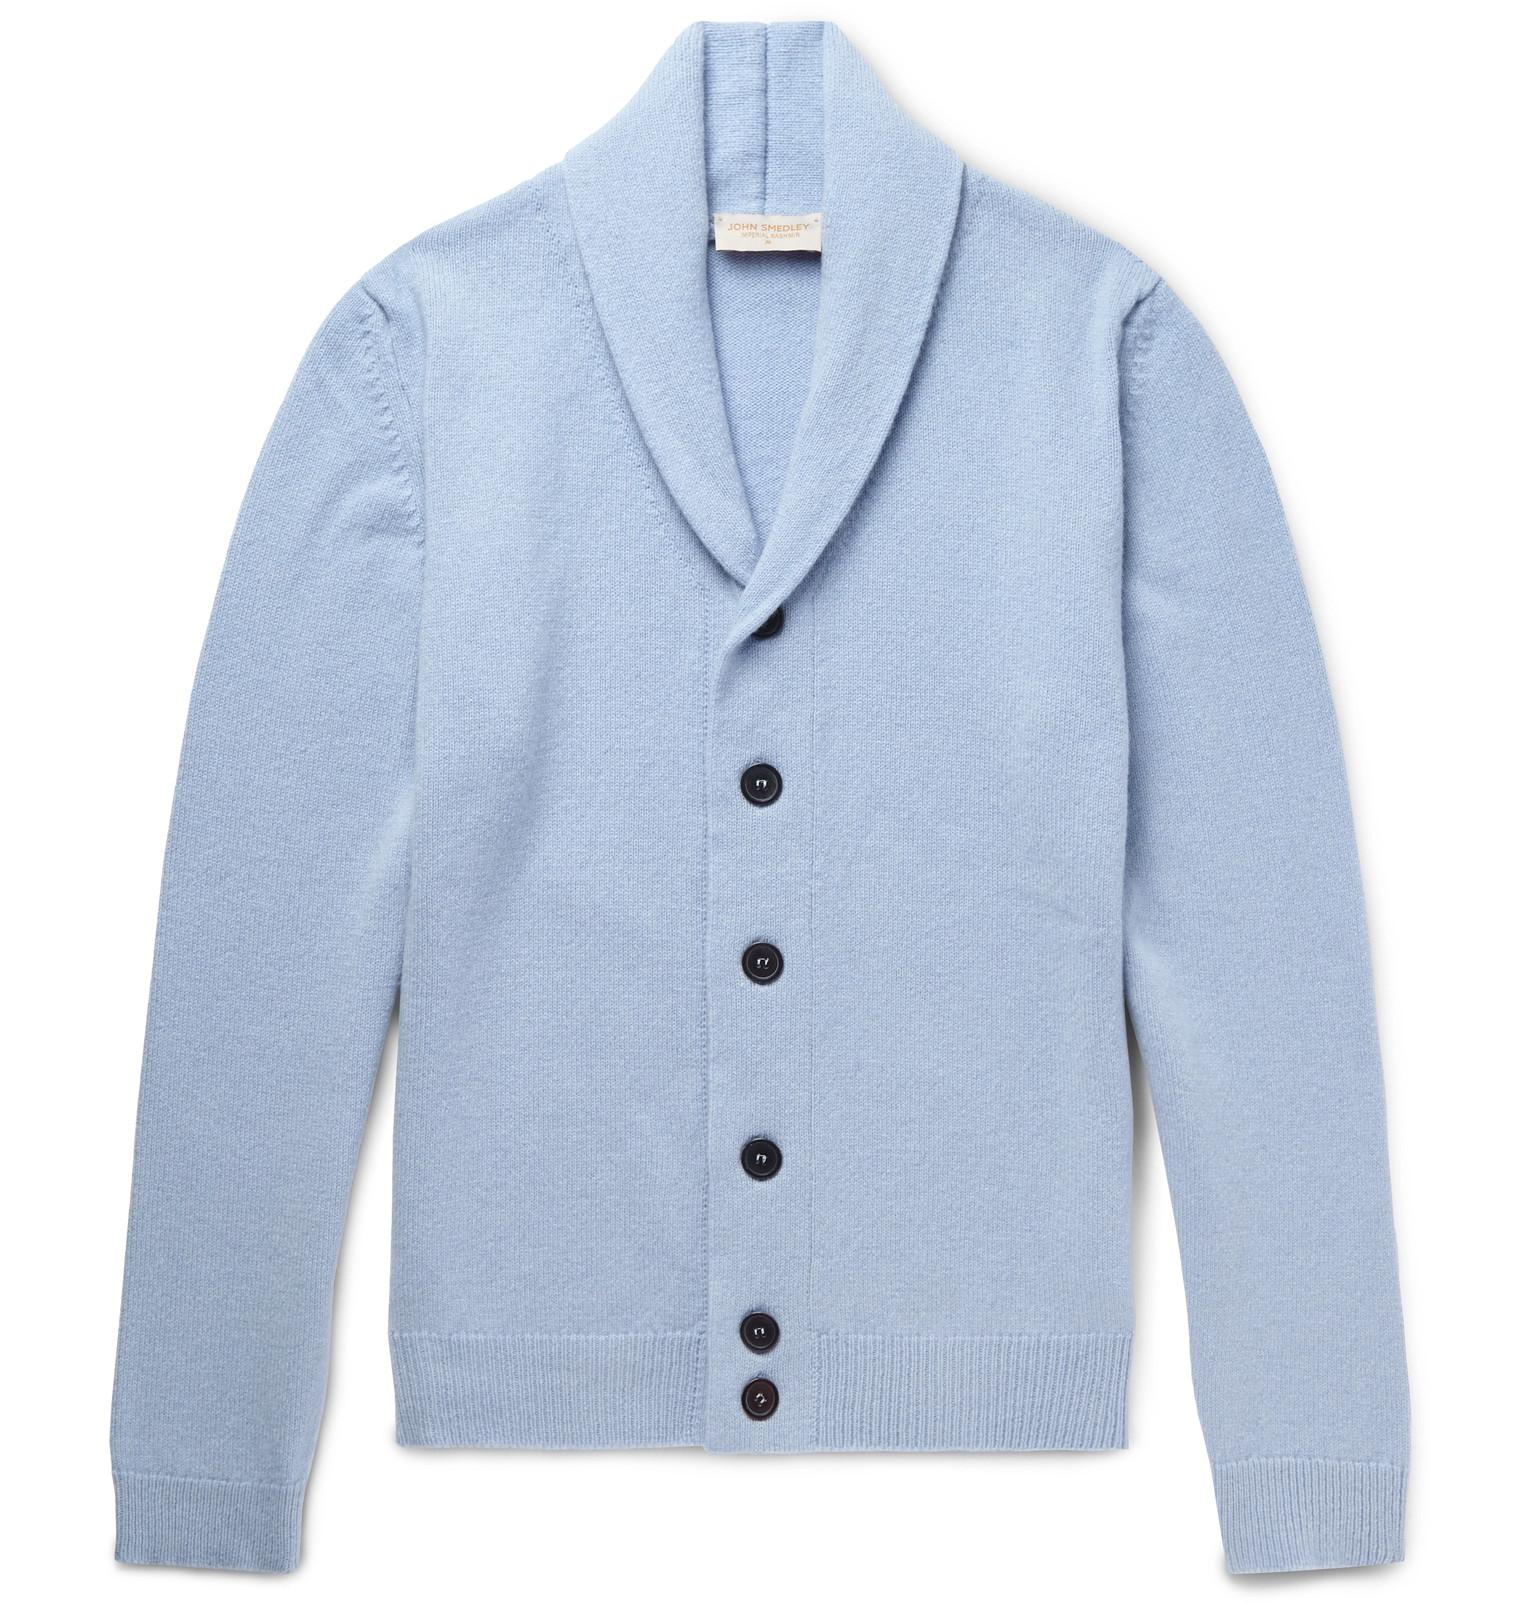 42e5903e2ba Lyst - John Smedley Patterson Slim-fit Shawl-collar Merino Wool And ...